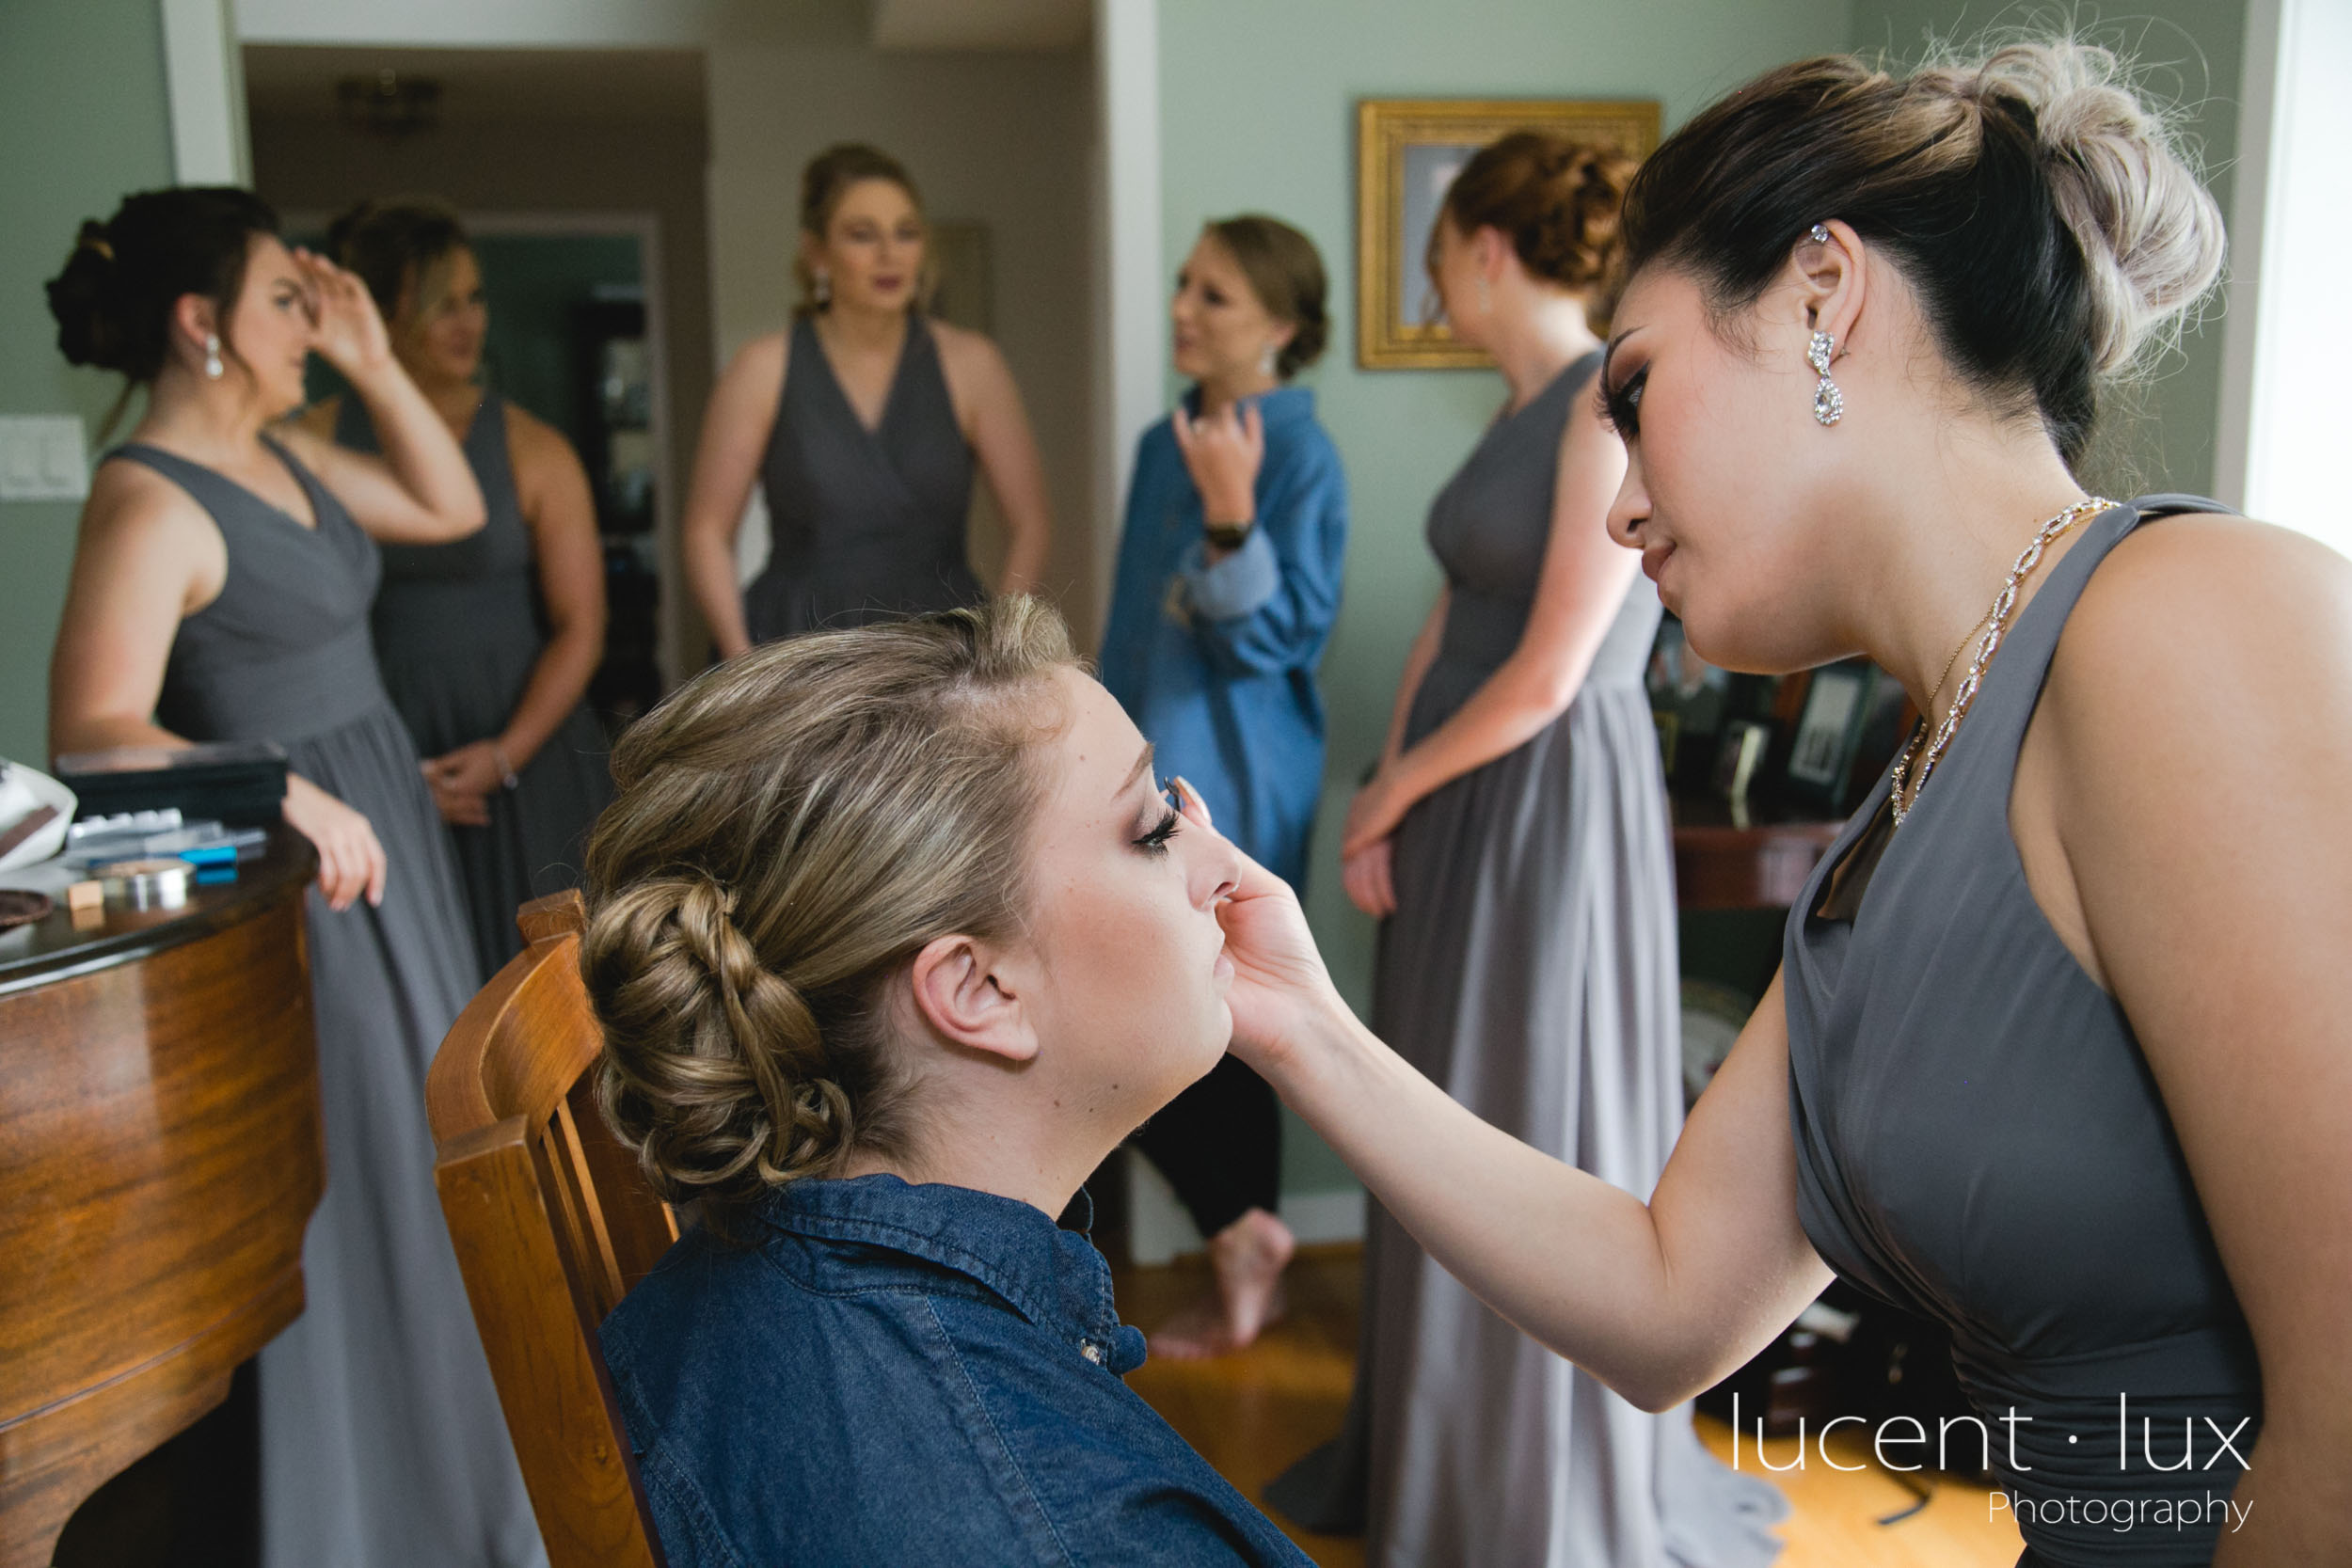 Wedding-Photography-Maryland-Pennsylvania-Photographer-Mendenhall-Inn-Media-Portrait-Event-104.jpg